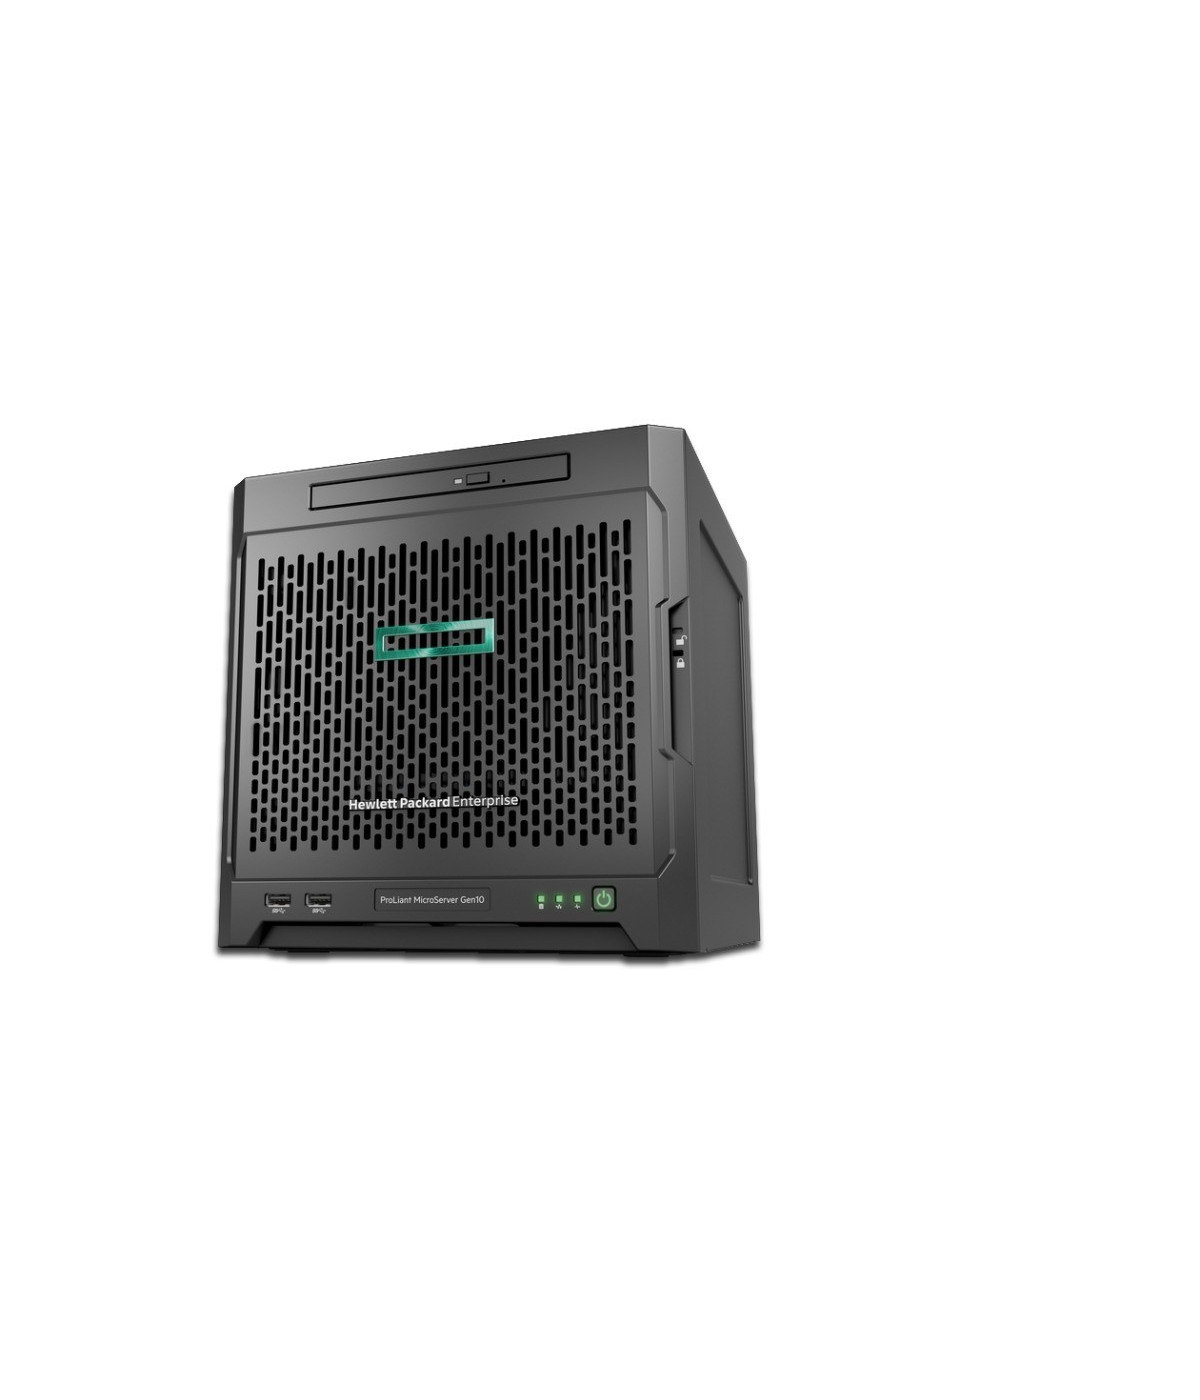 Servidor HPE Proliant Microserver Gen10 P04923-S01